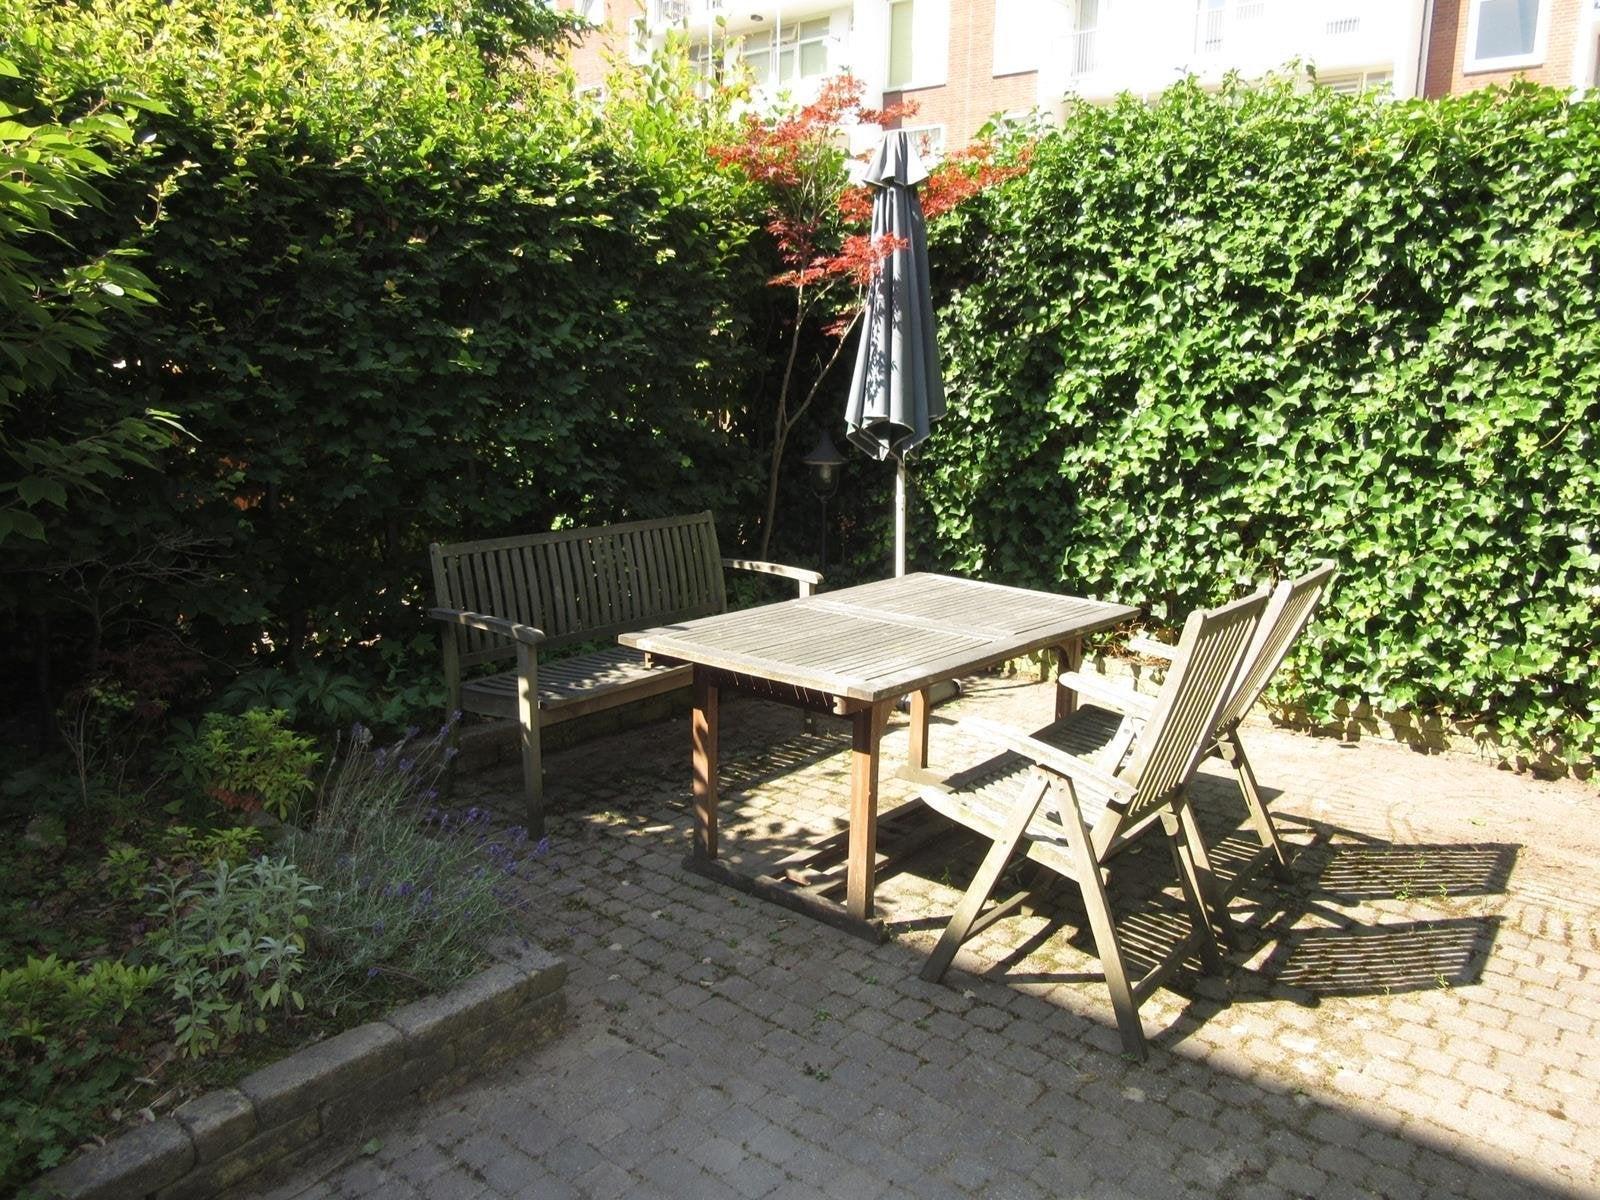 https://public.parariusoffice.nl/15/photos/huge/2612043.1501590858-605.jpg